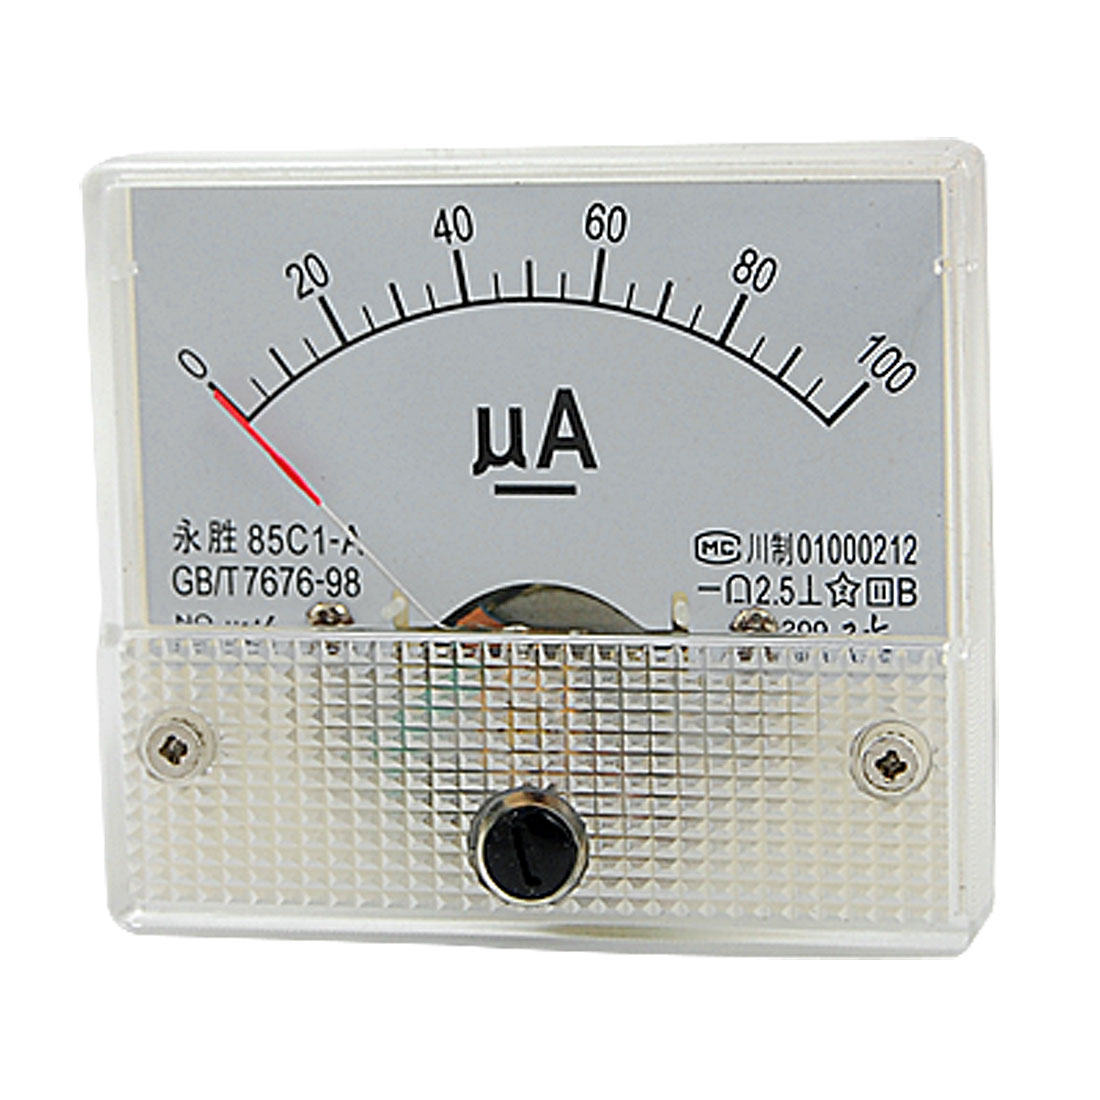 85C1-A DC 0-100uA Analog Panel Meter Ammeter Gauge New